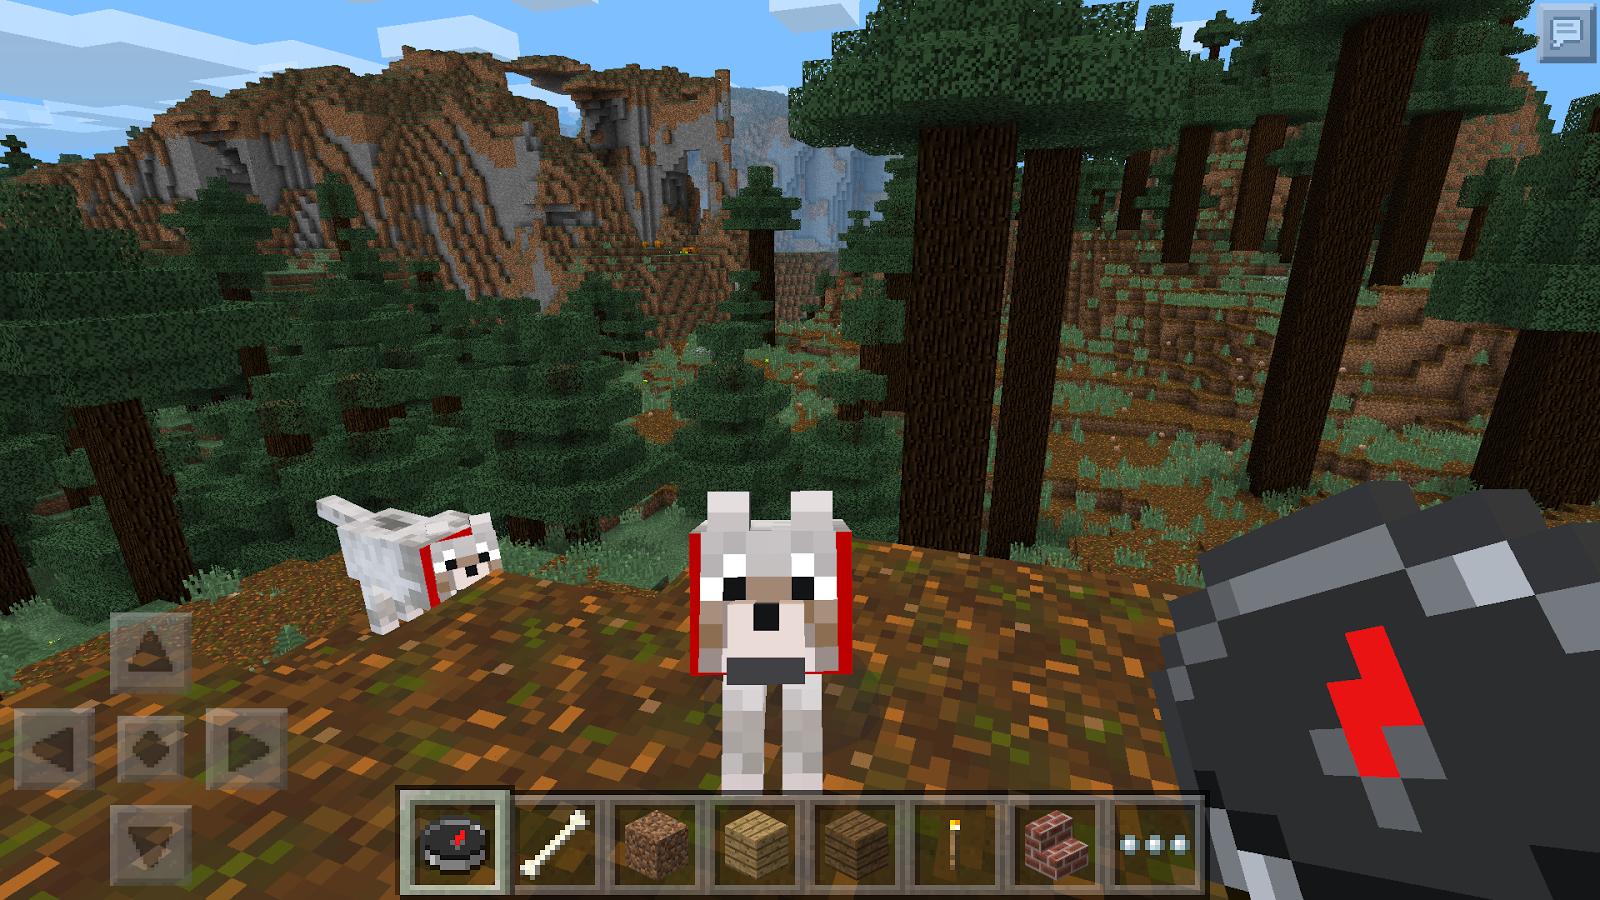 Картинки Minecraft | 73 фотографий | ВКонтакте